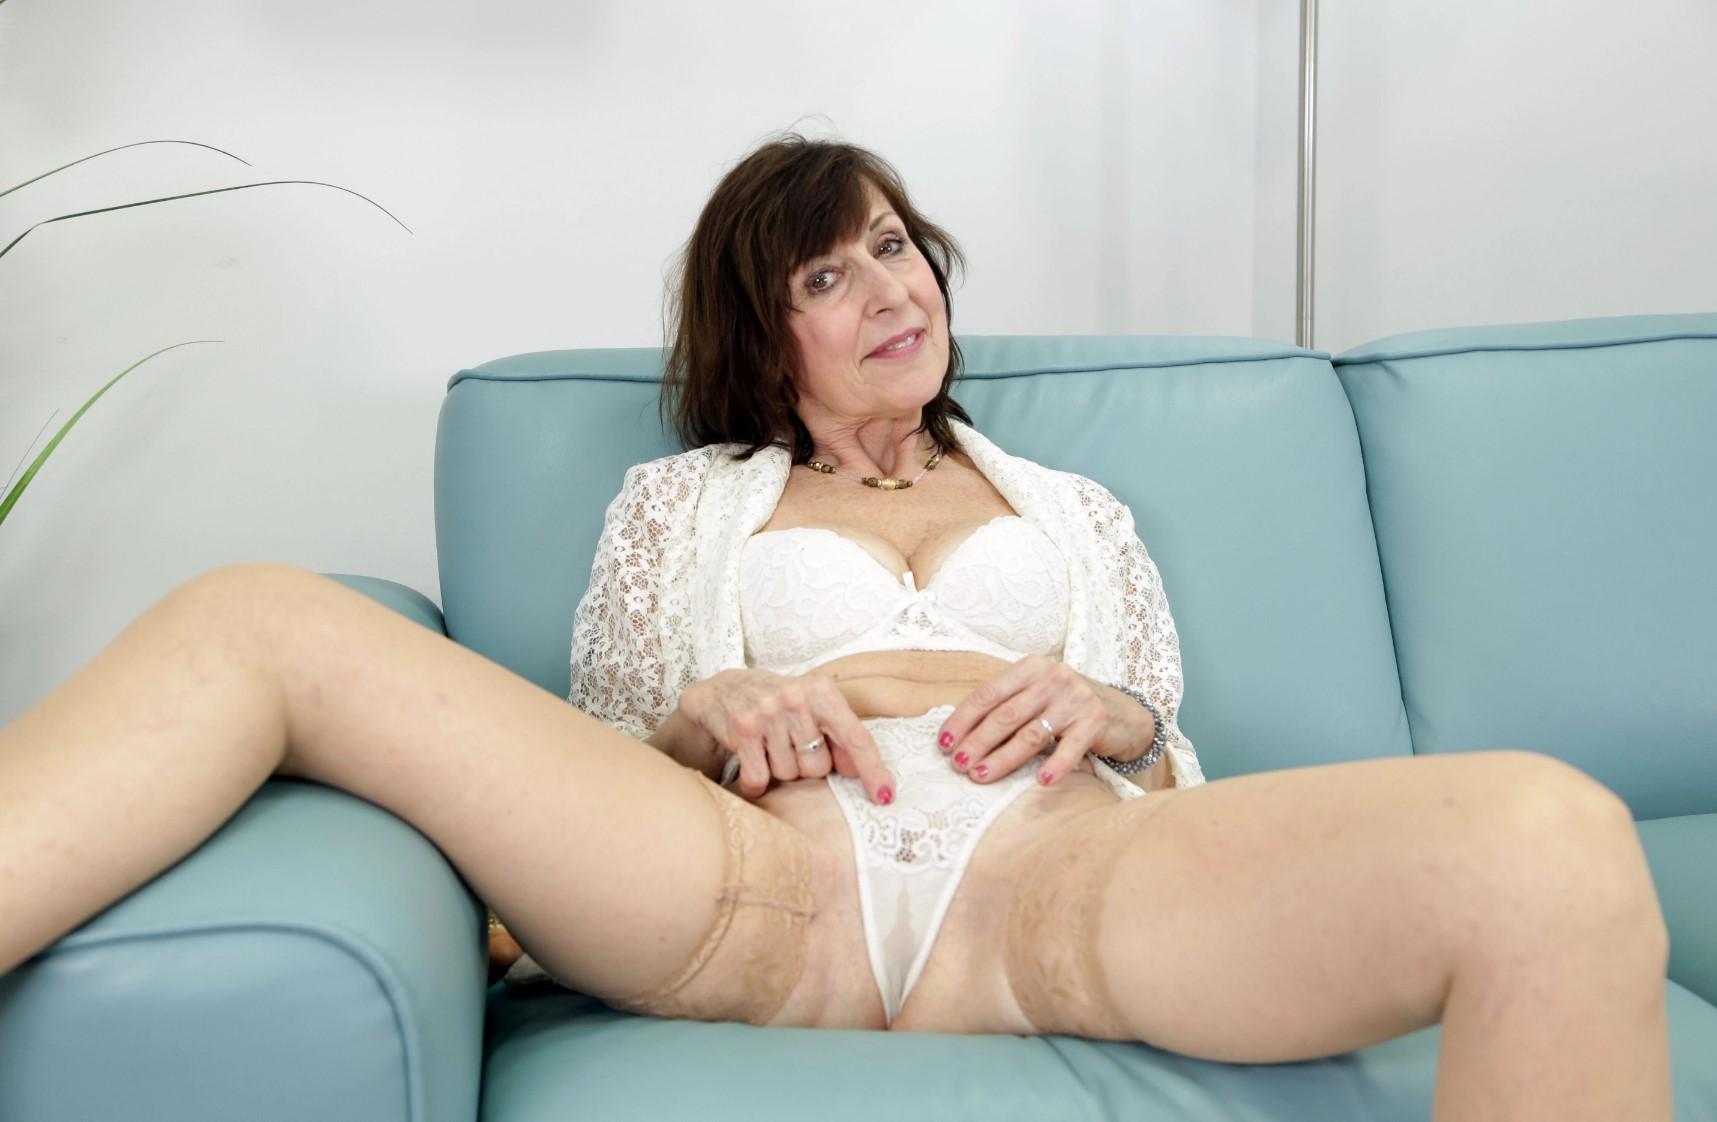 Lady Valentina - Needs Sex Too Oculus Rift